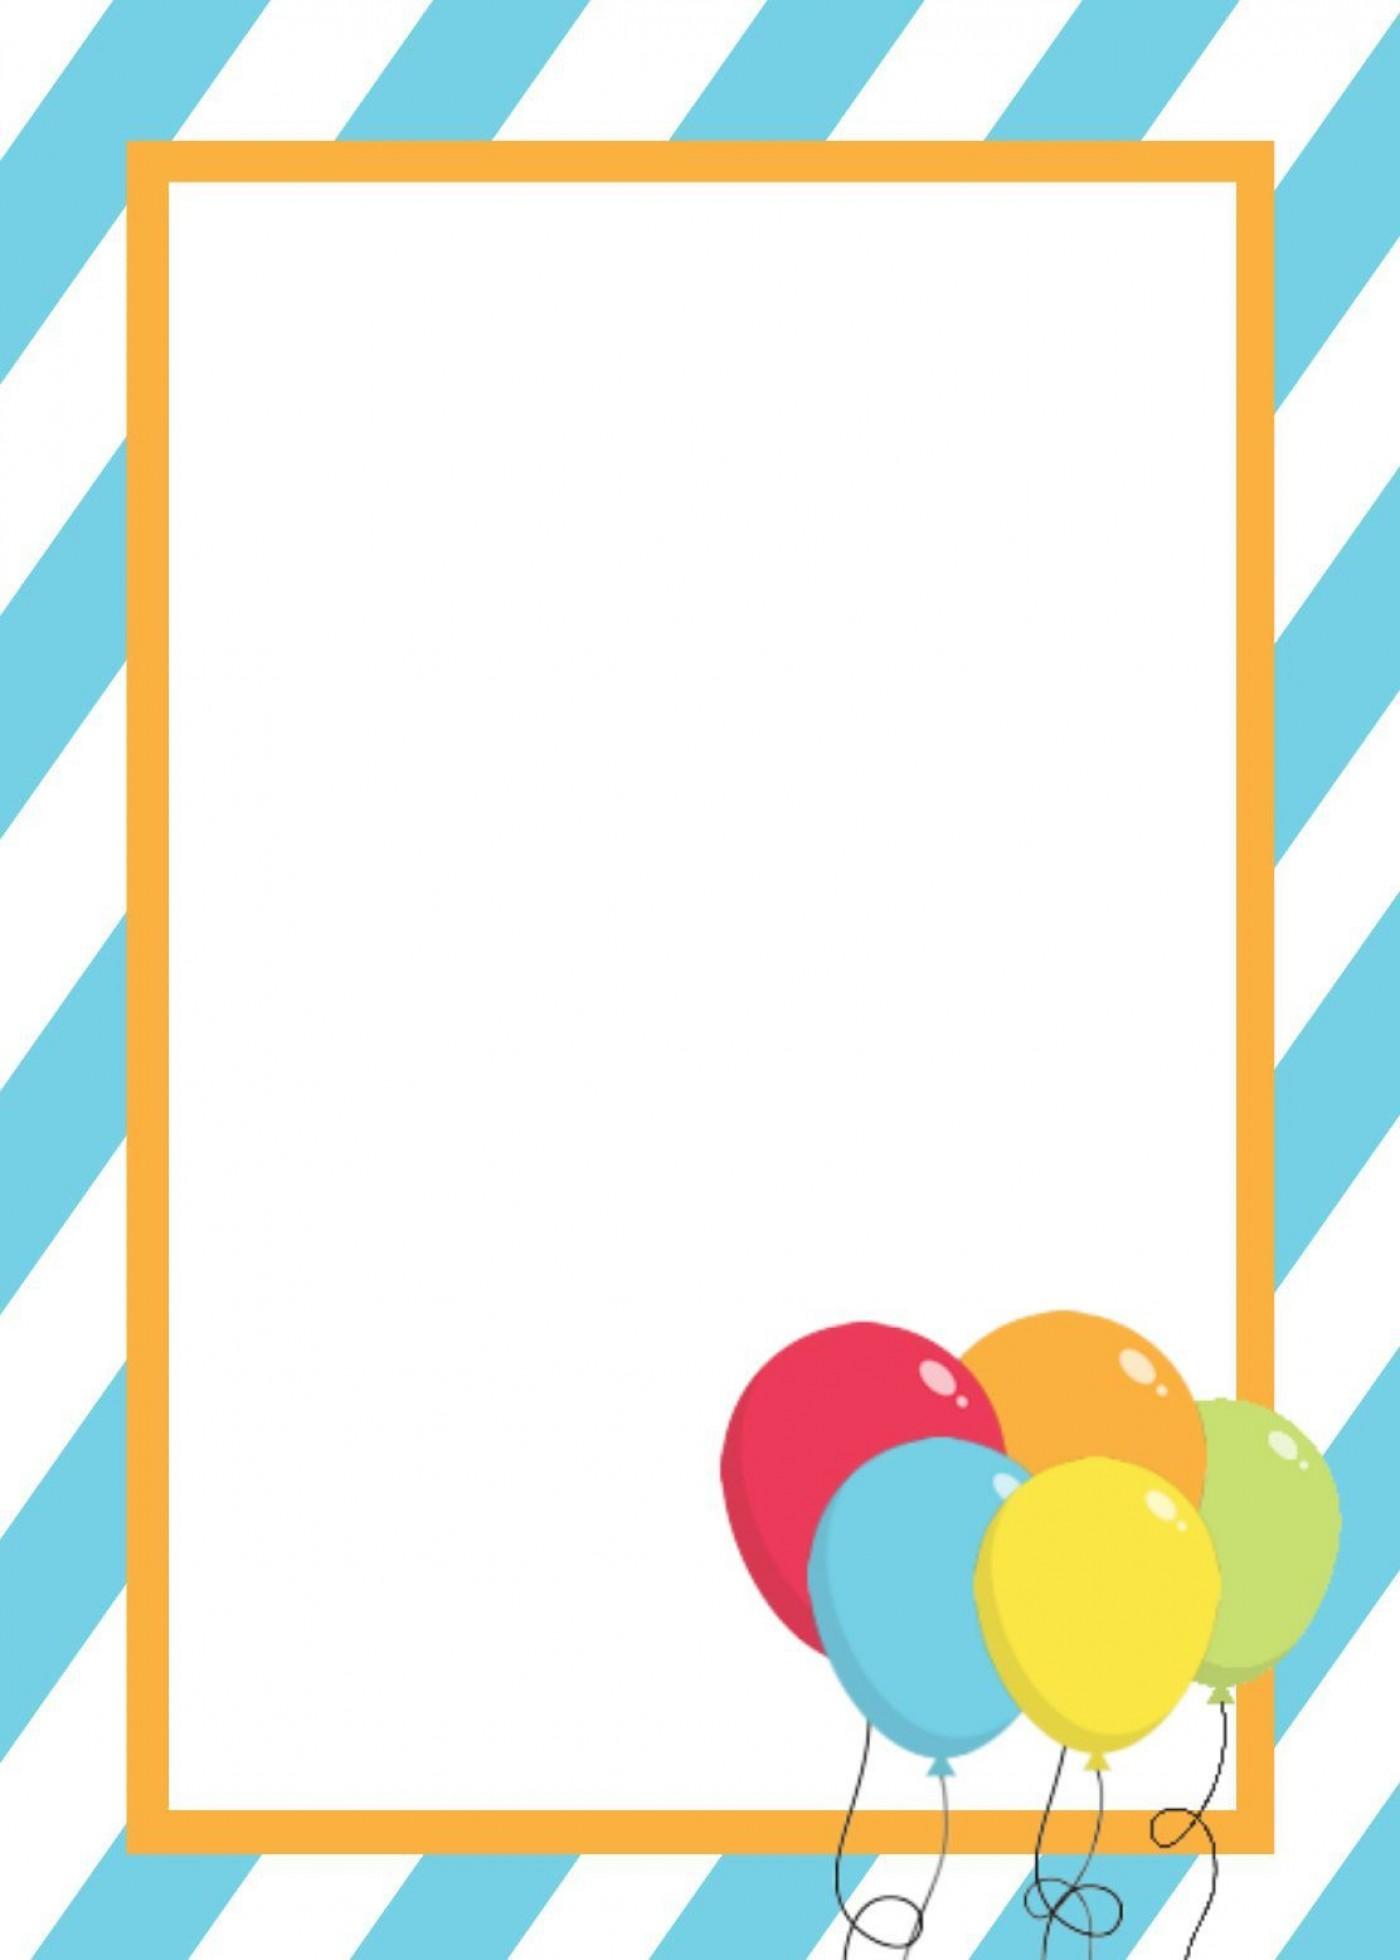 002 Staggering Microsoft Word Birthday Invitation Template Inspiration  Editable 50th 60th1400